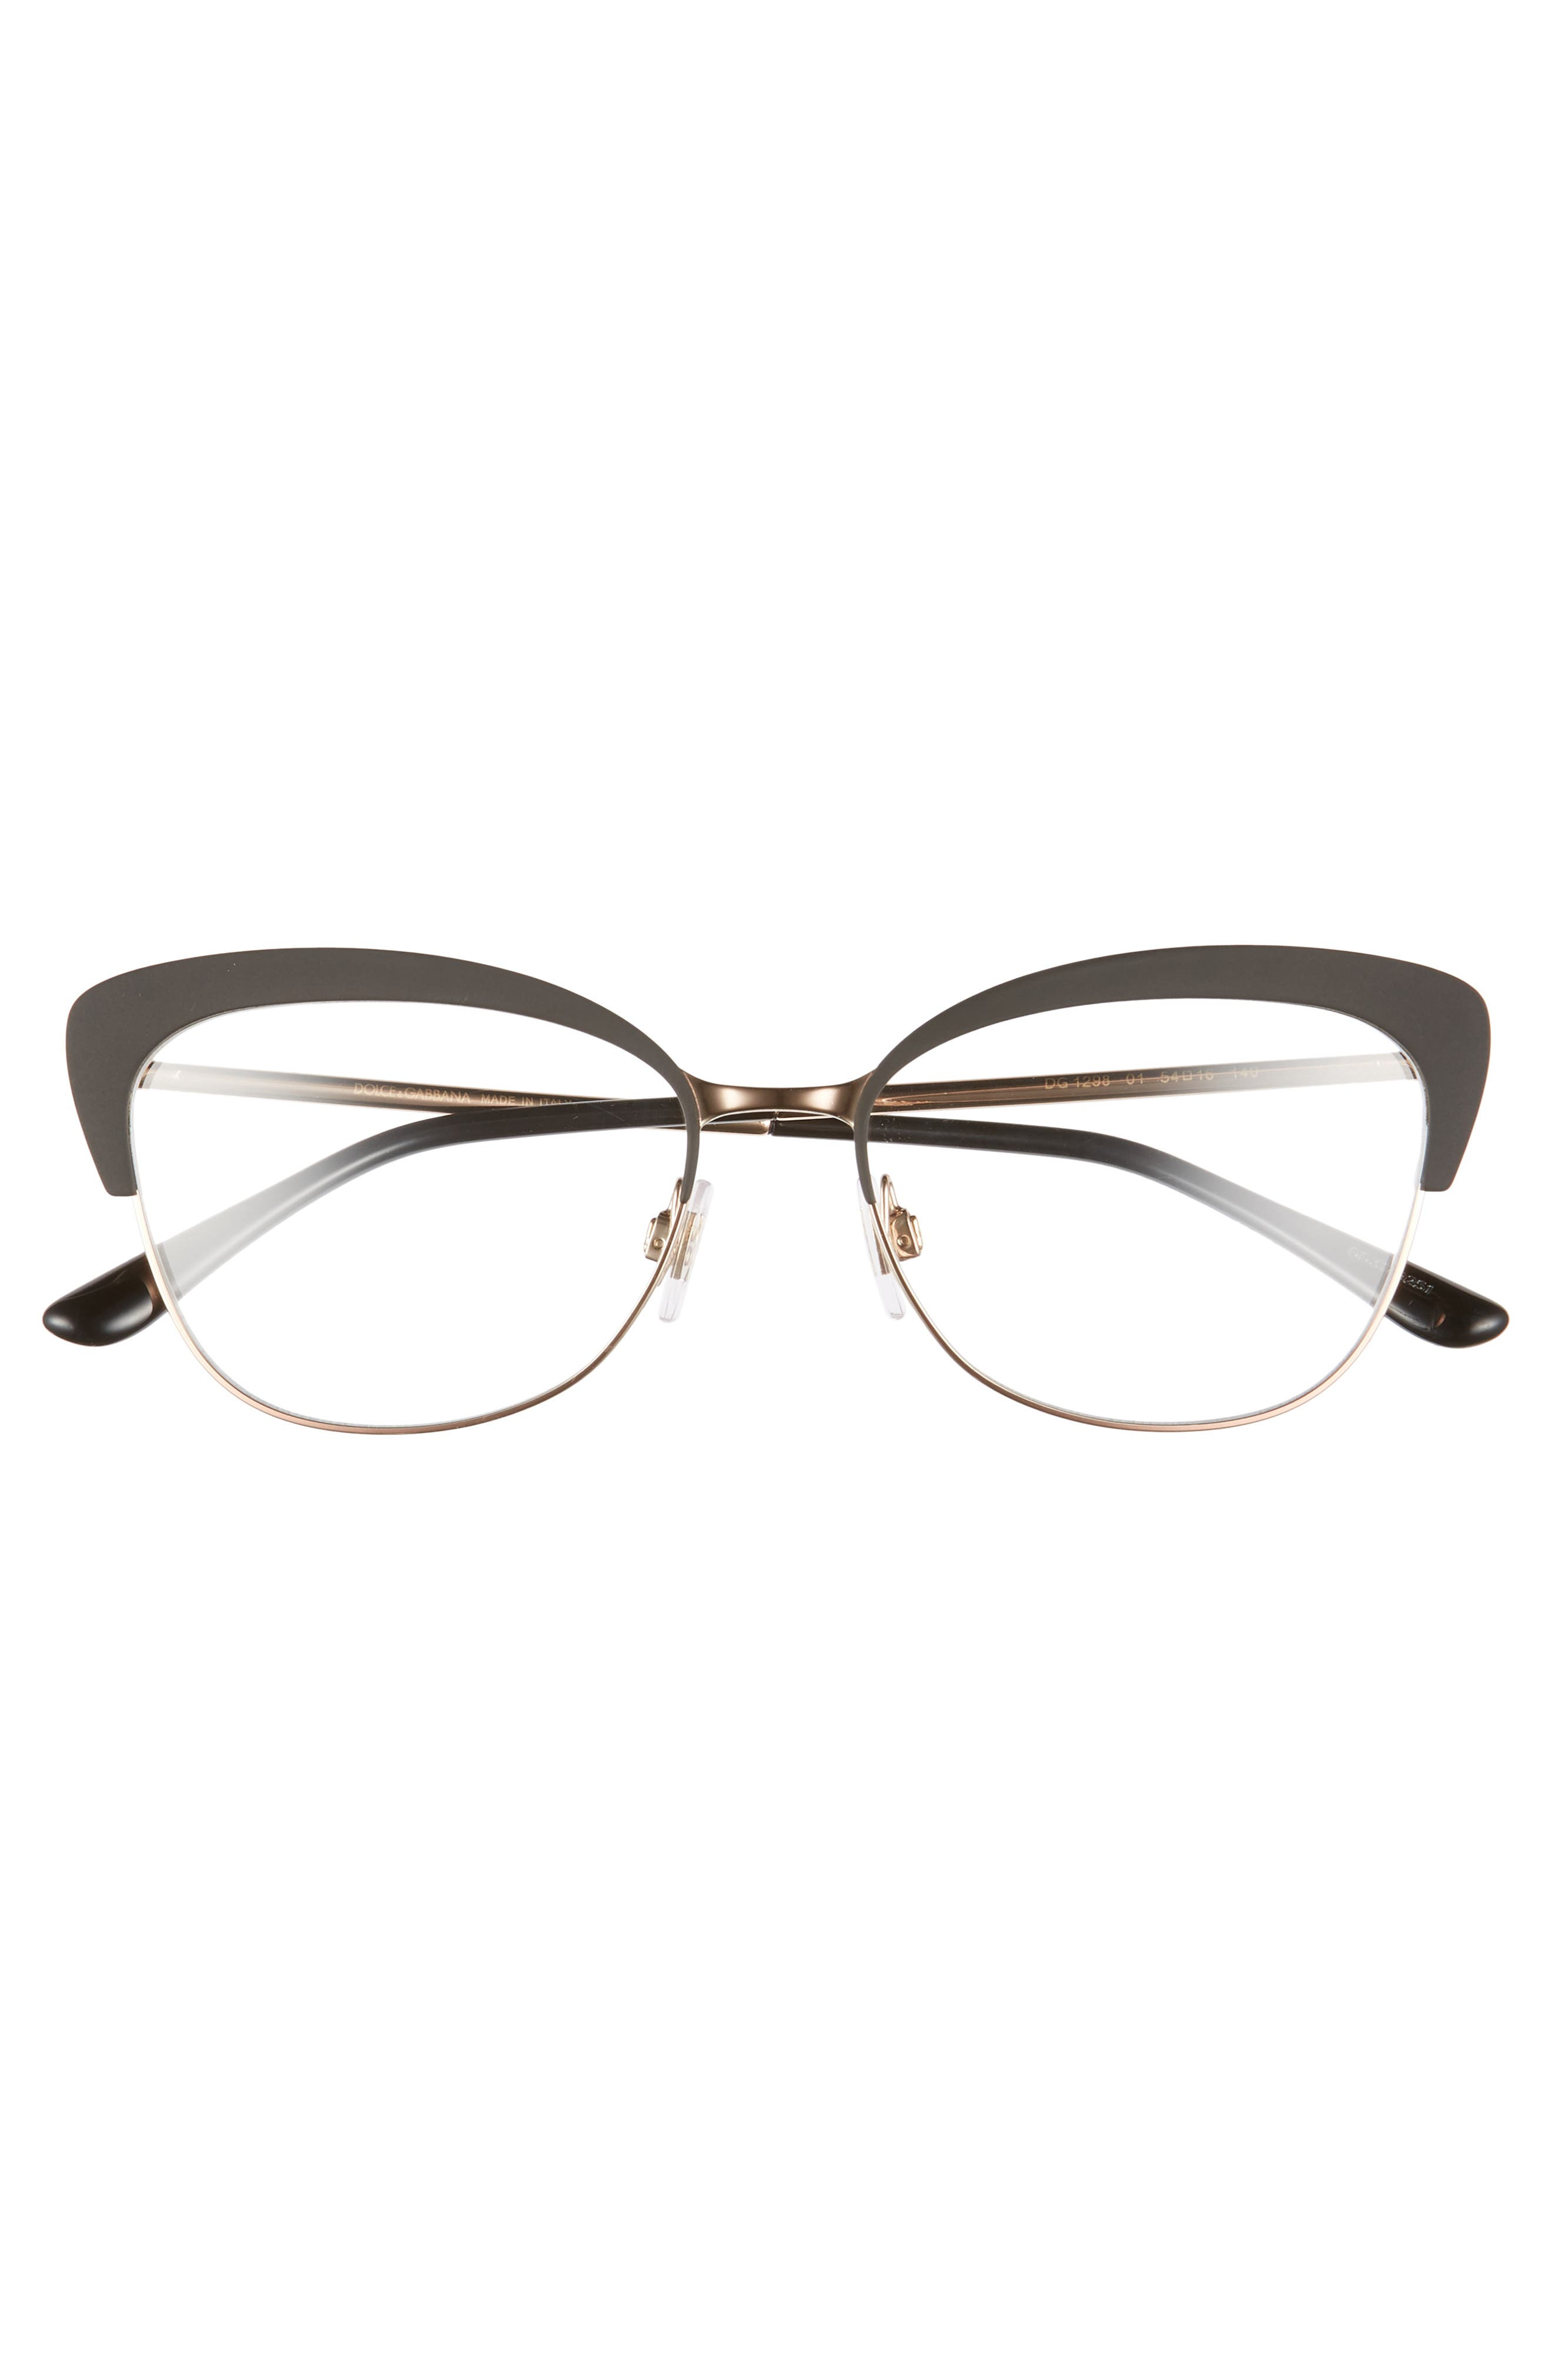 54mm Optical Glasses,                             Alternate thumbnail 3, color,                             BLACK/ PINK